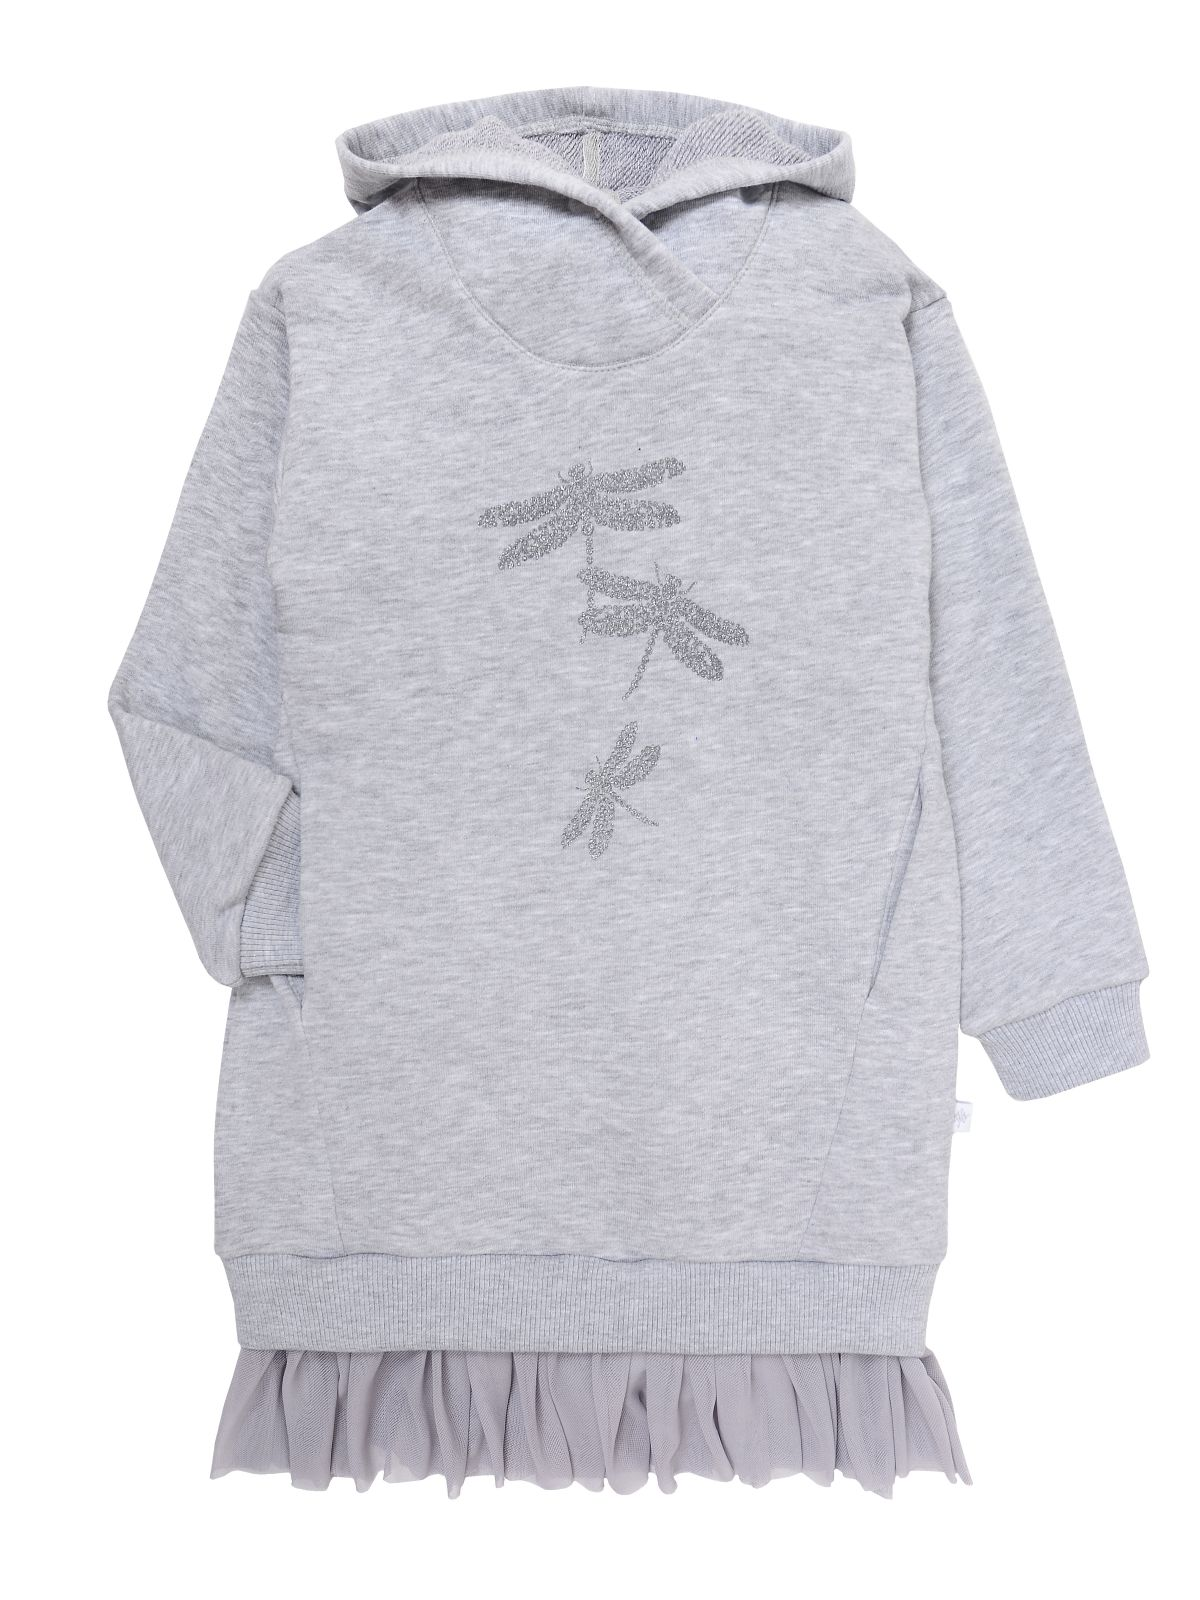 Платье для девочки Мамуляндия 19-835 Футер, Серый меланж р. 122 фото